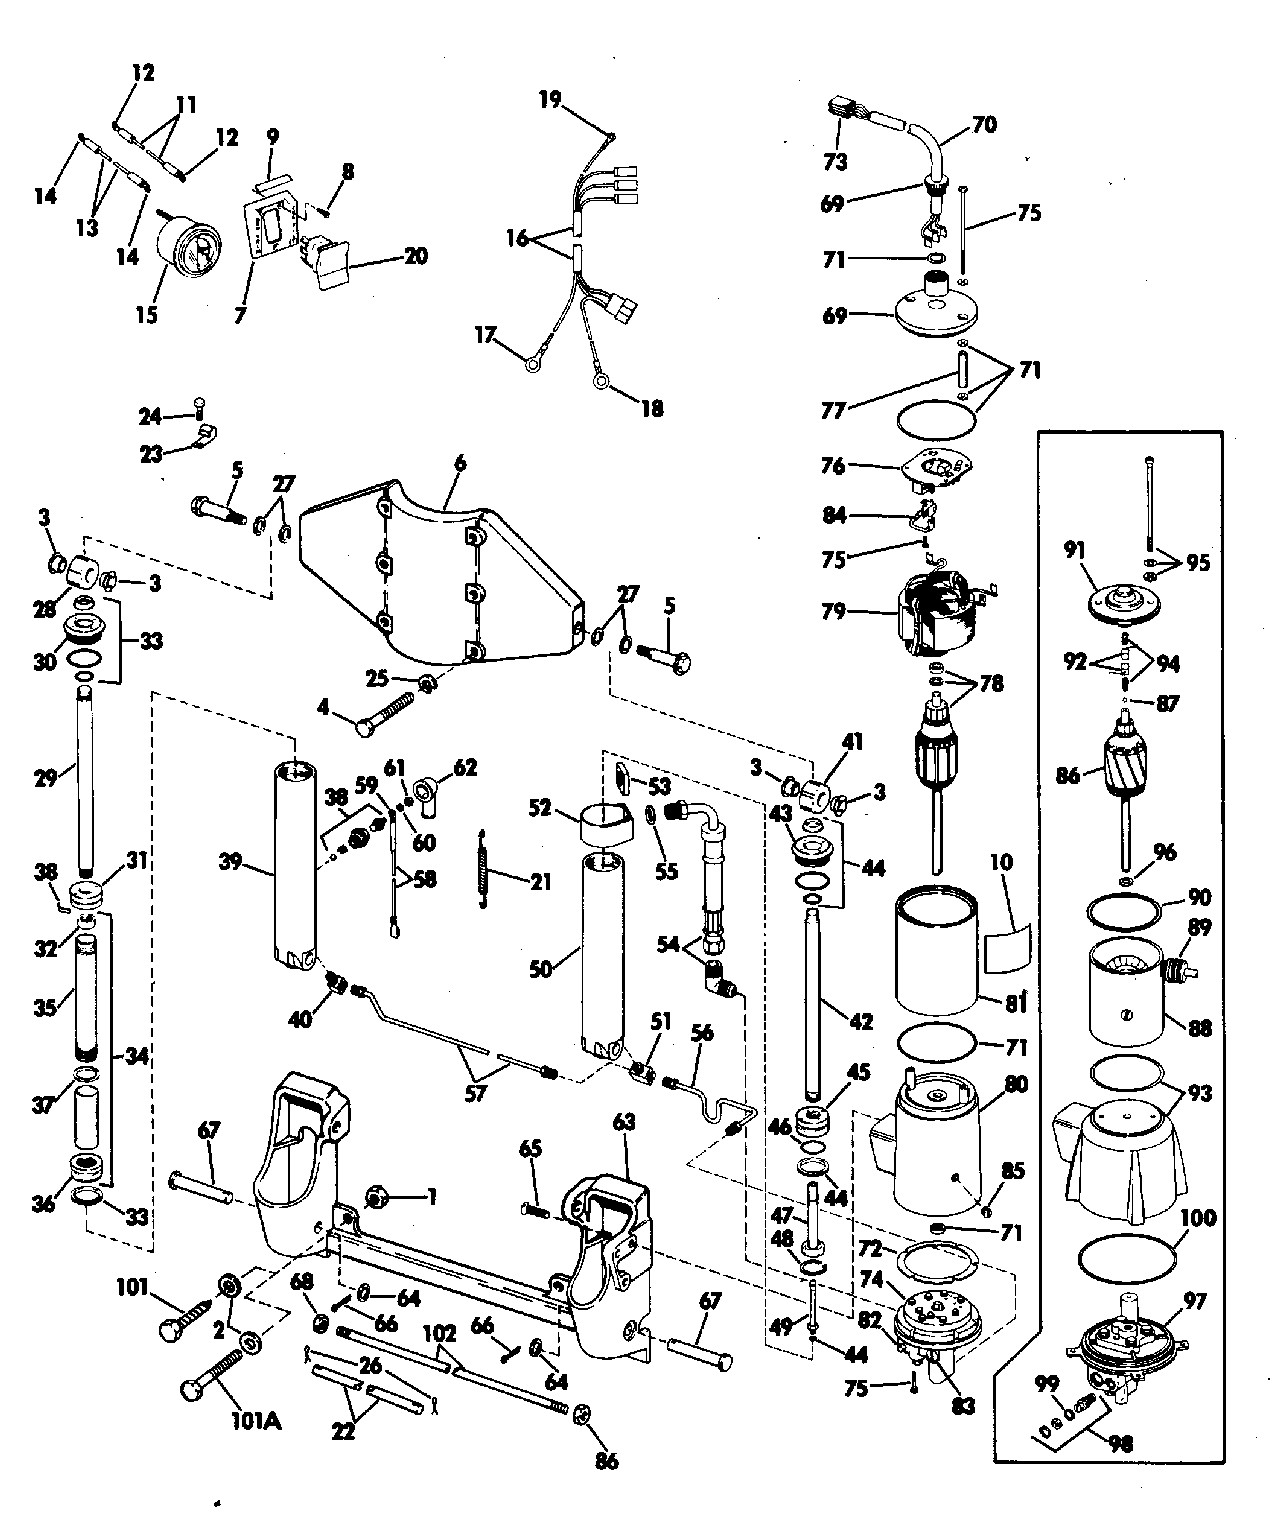 Evinrude 15 Hp Parts Diagram Maintaining Johnson Evinrude